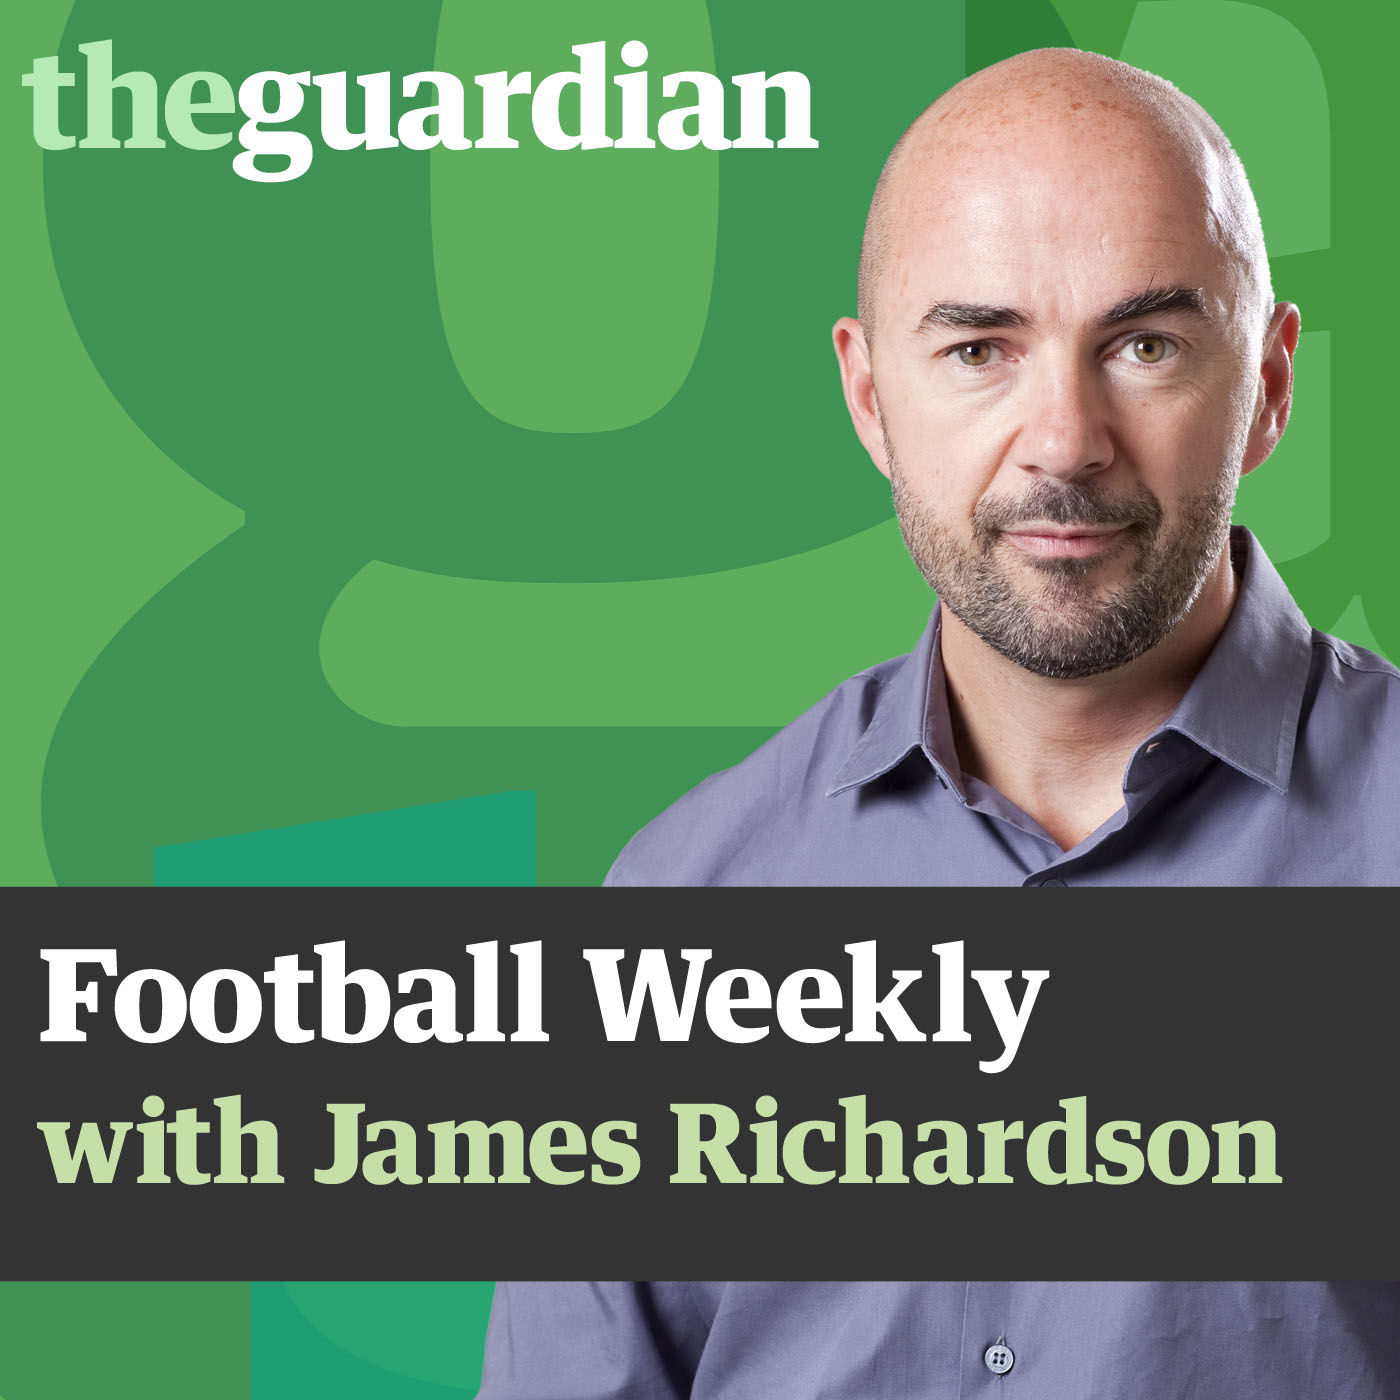 football_weekly_1400.jpg